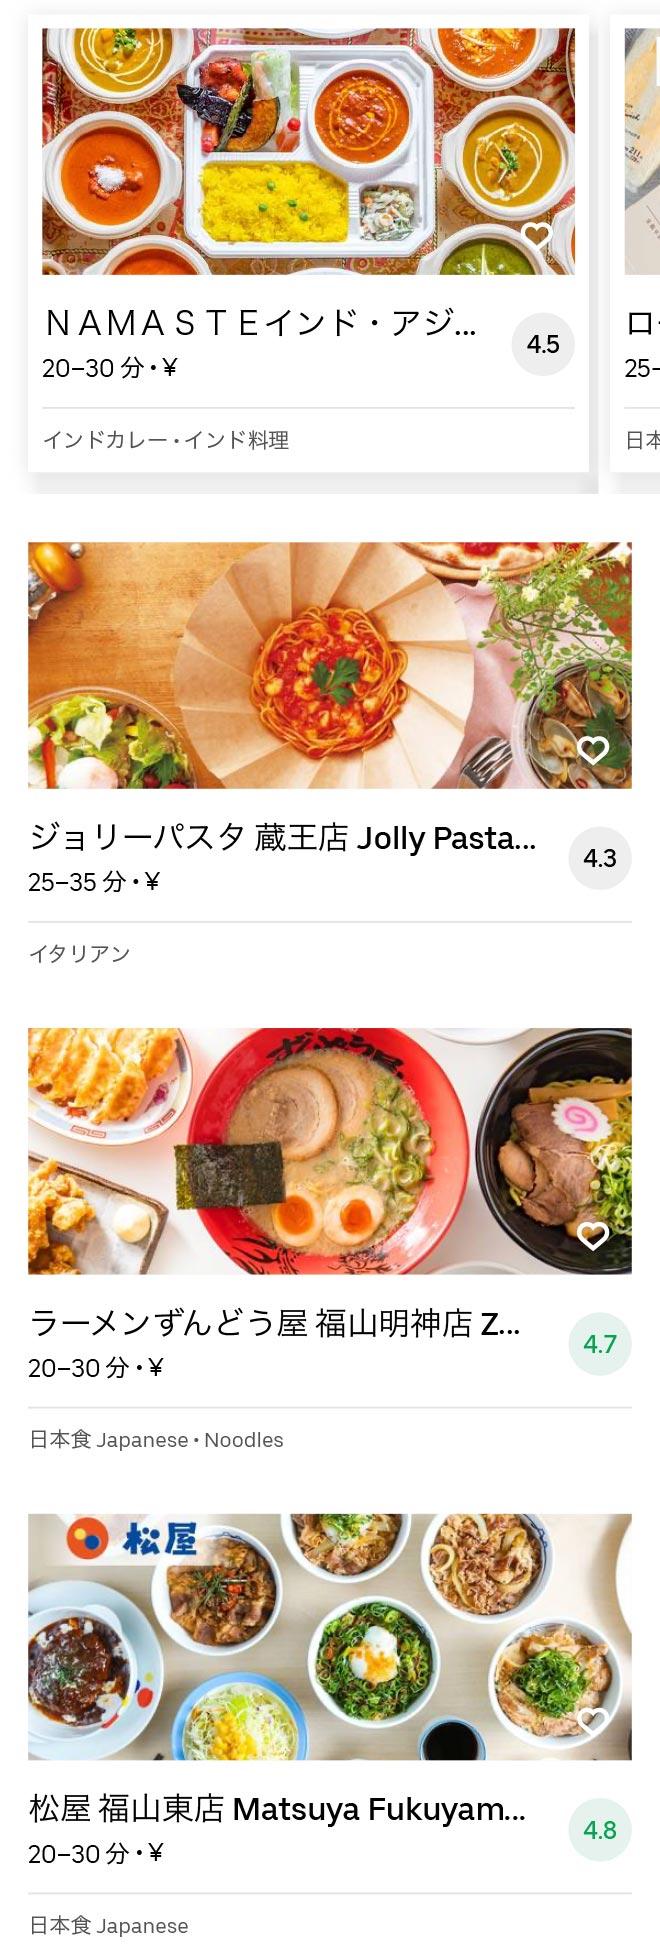 Higashi fukuyama menu 2010 02